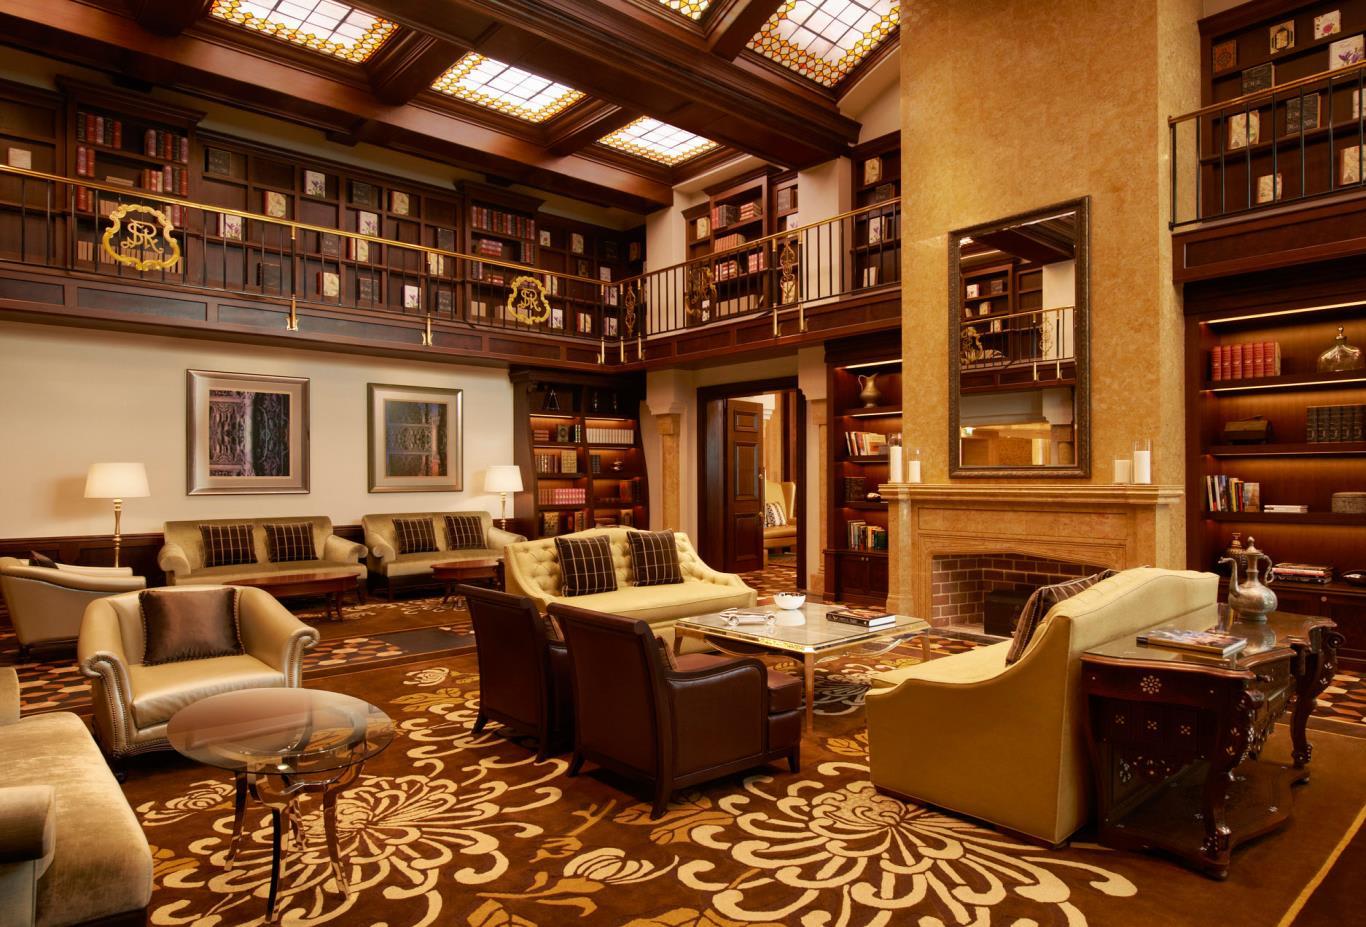 The St Regis Bar Library